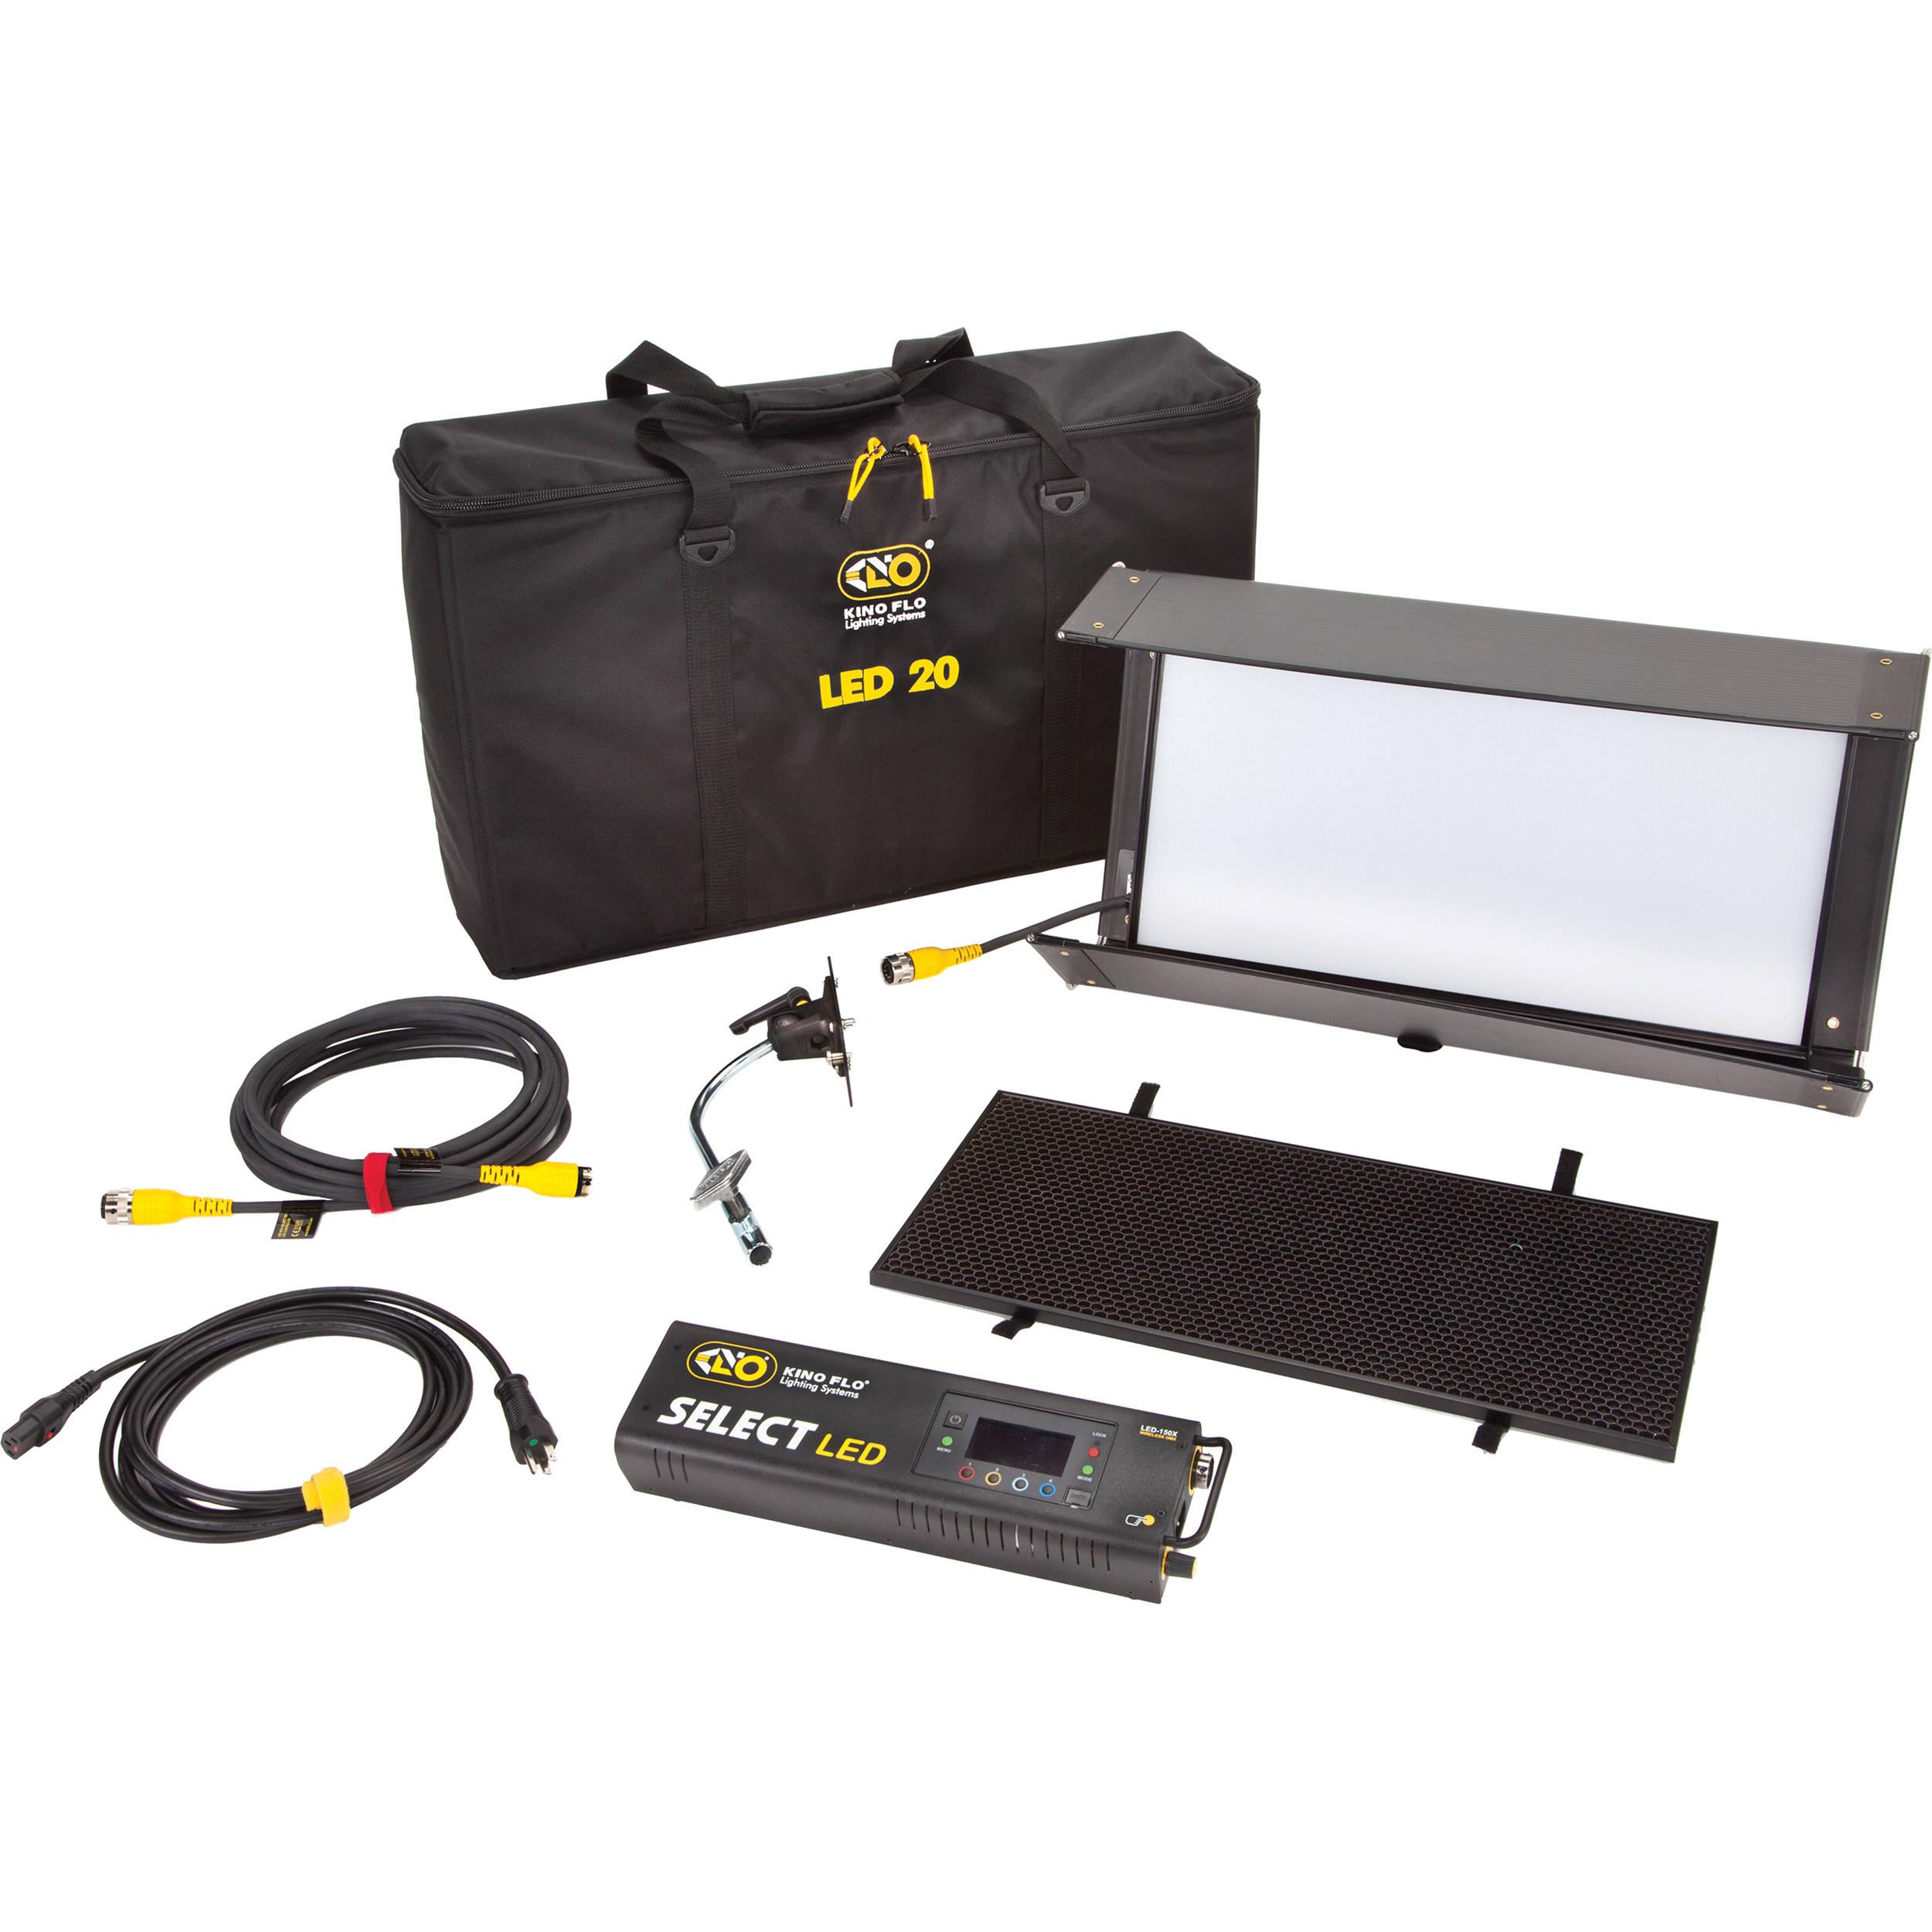 Kino Flo Select 12 DMX Kit with Soft Case